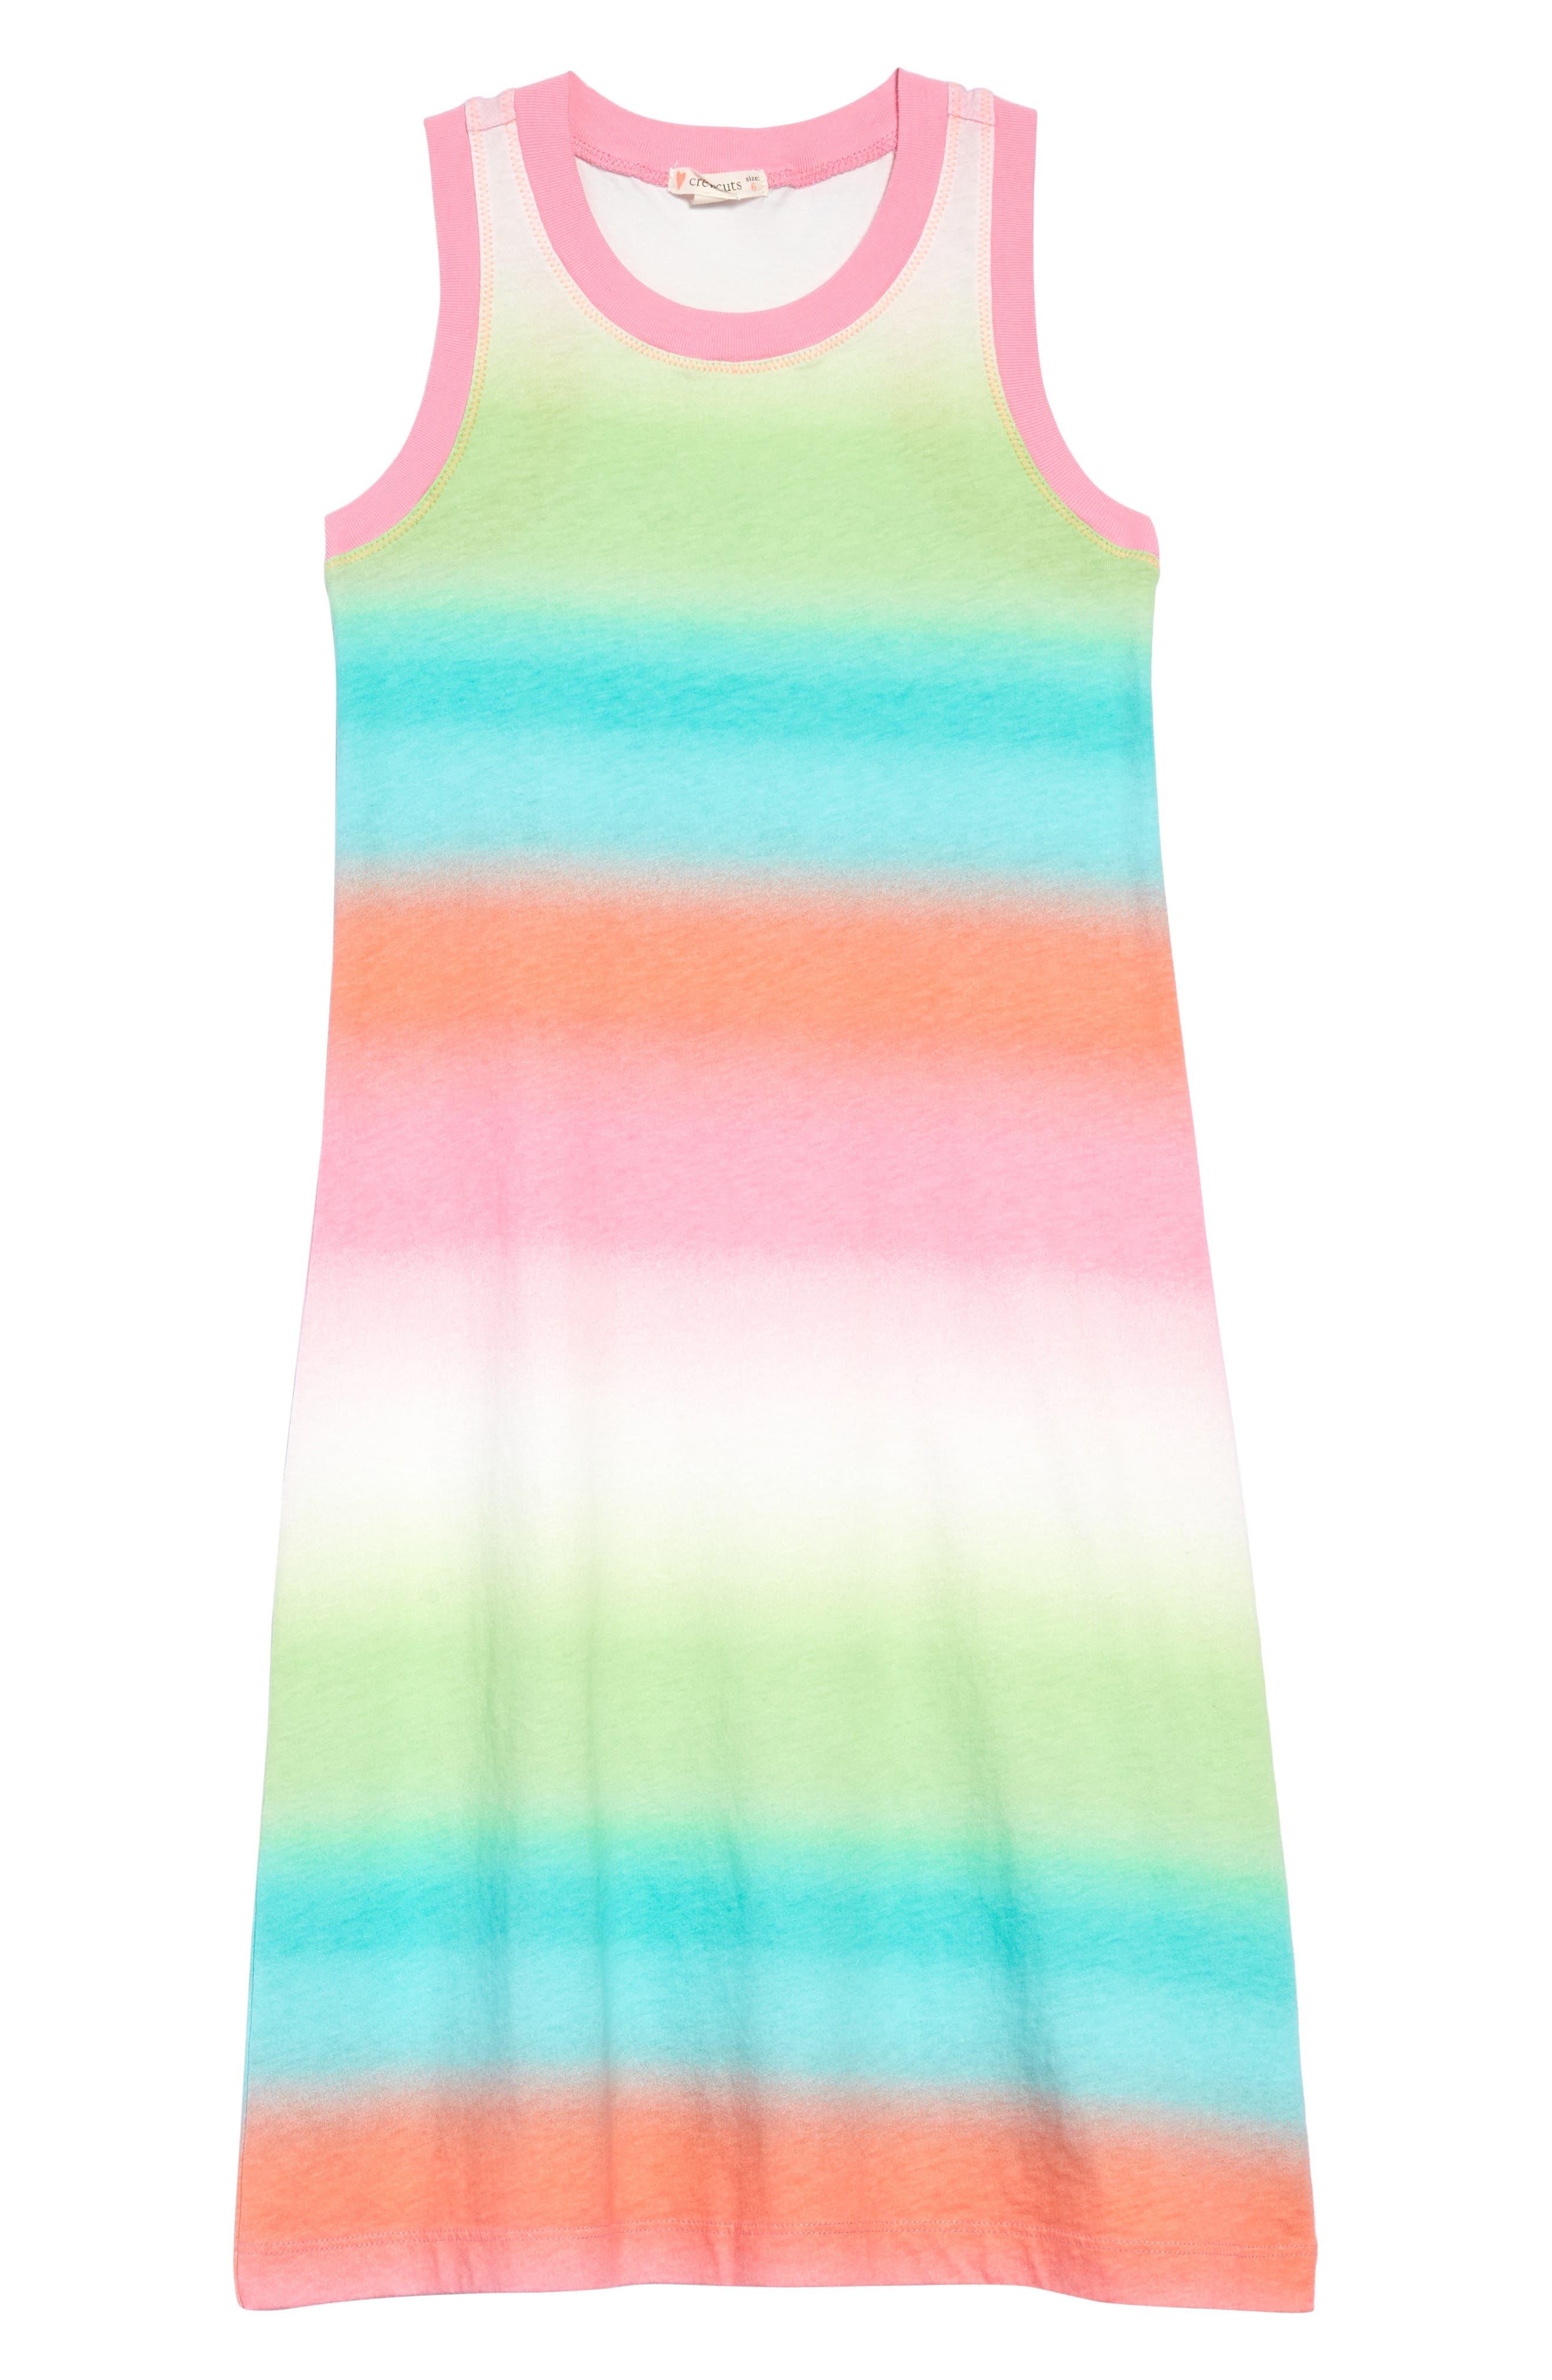 Girls Crewcuts By Jcrew Ombre Stripe Maxi Dress Size 16  Pink